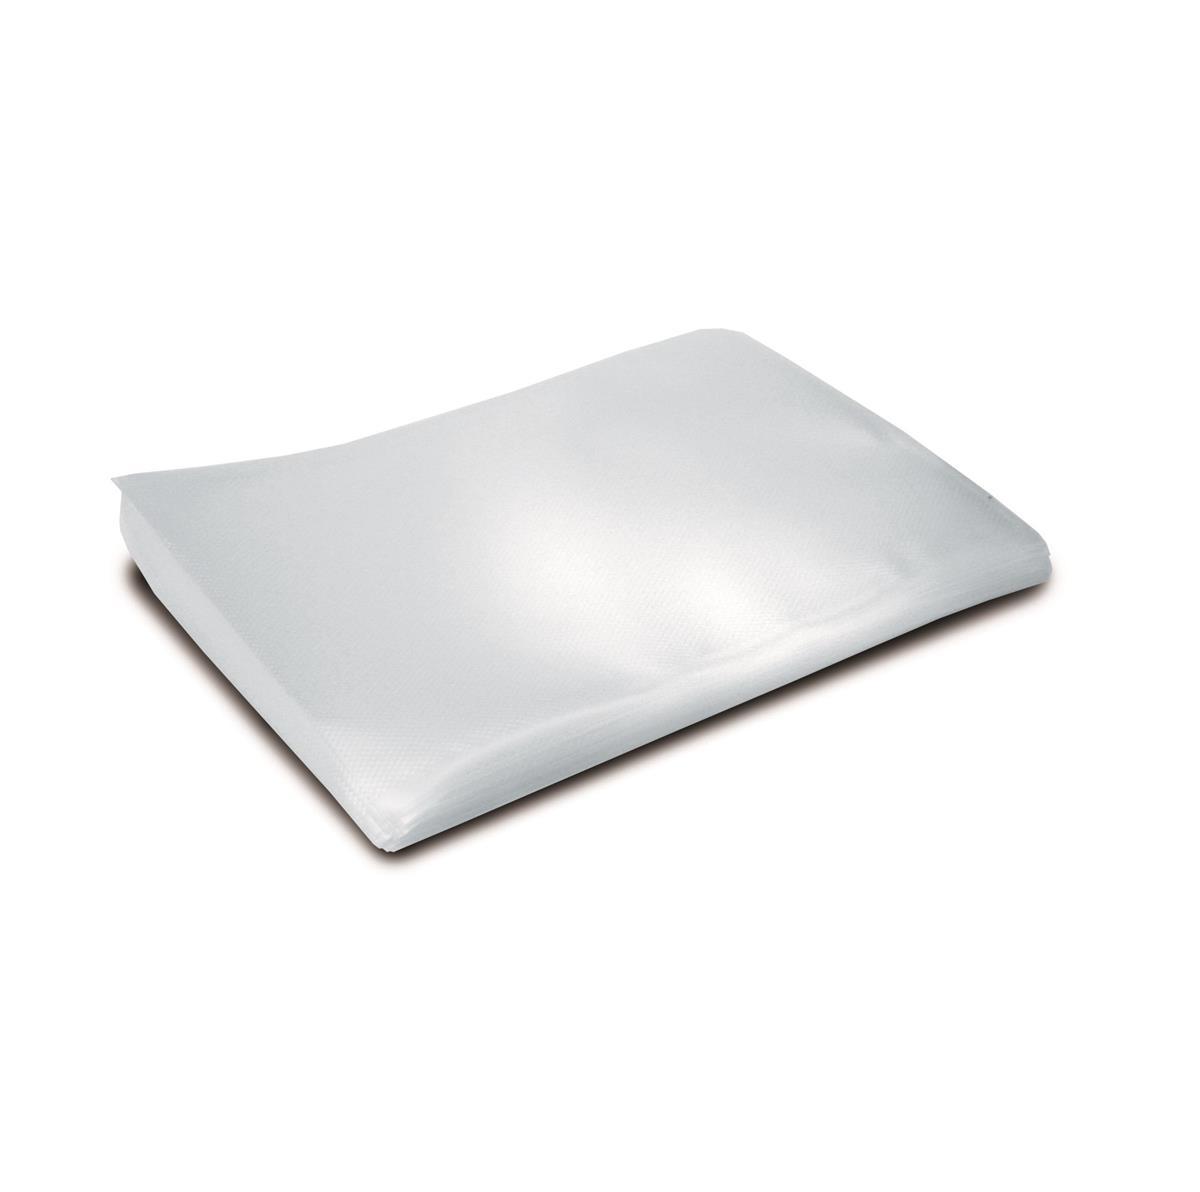 Bags 16x23cm, 50 pcs